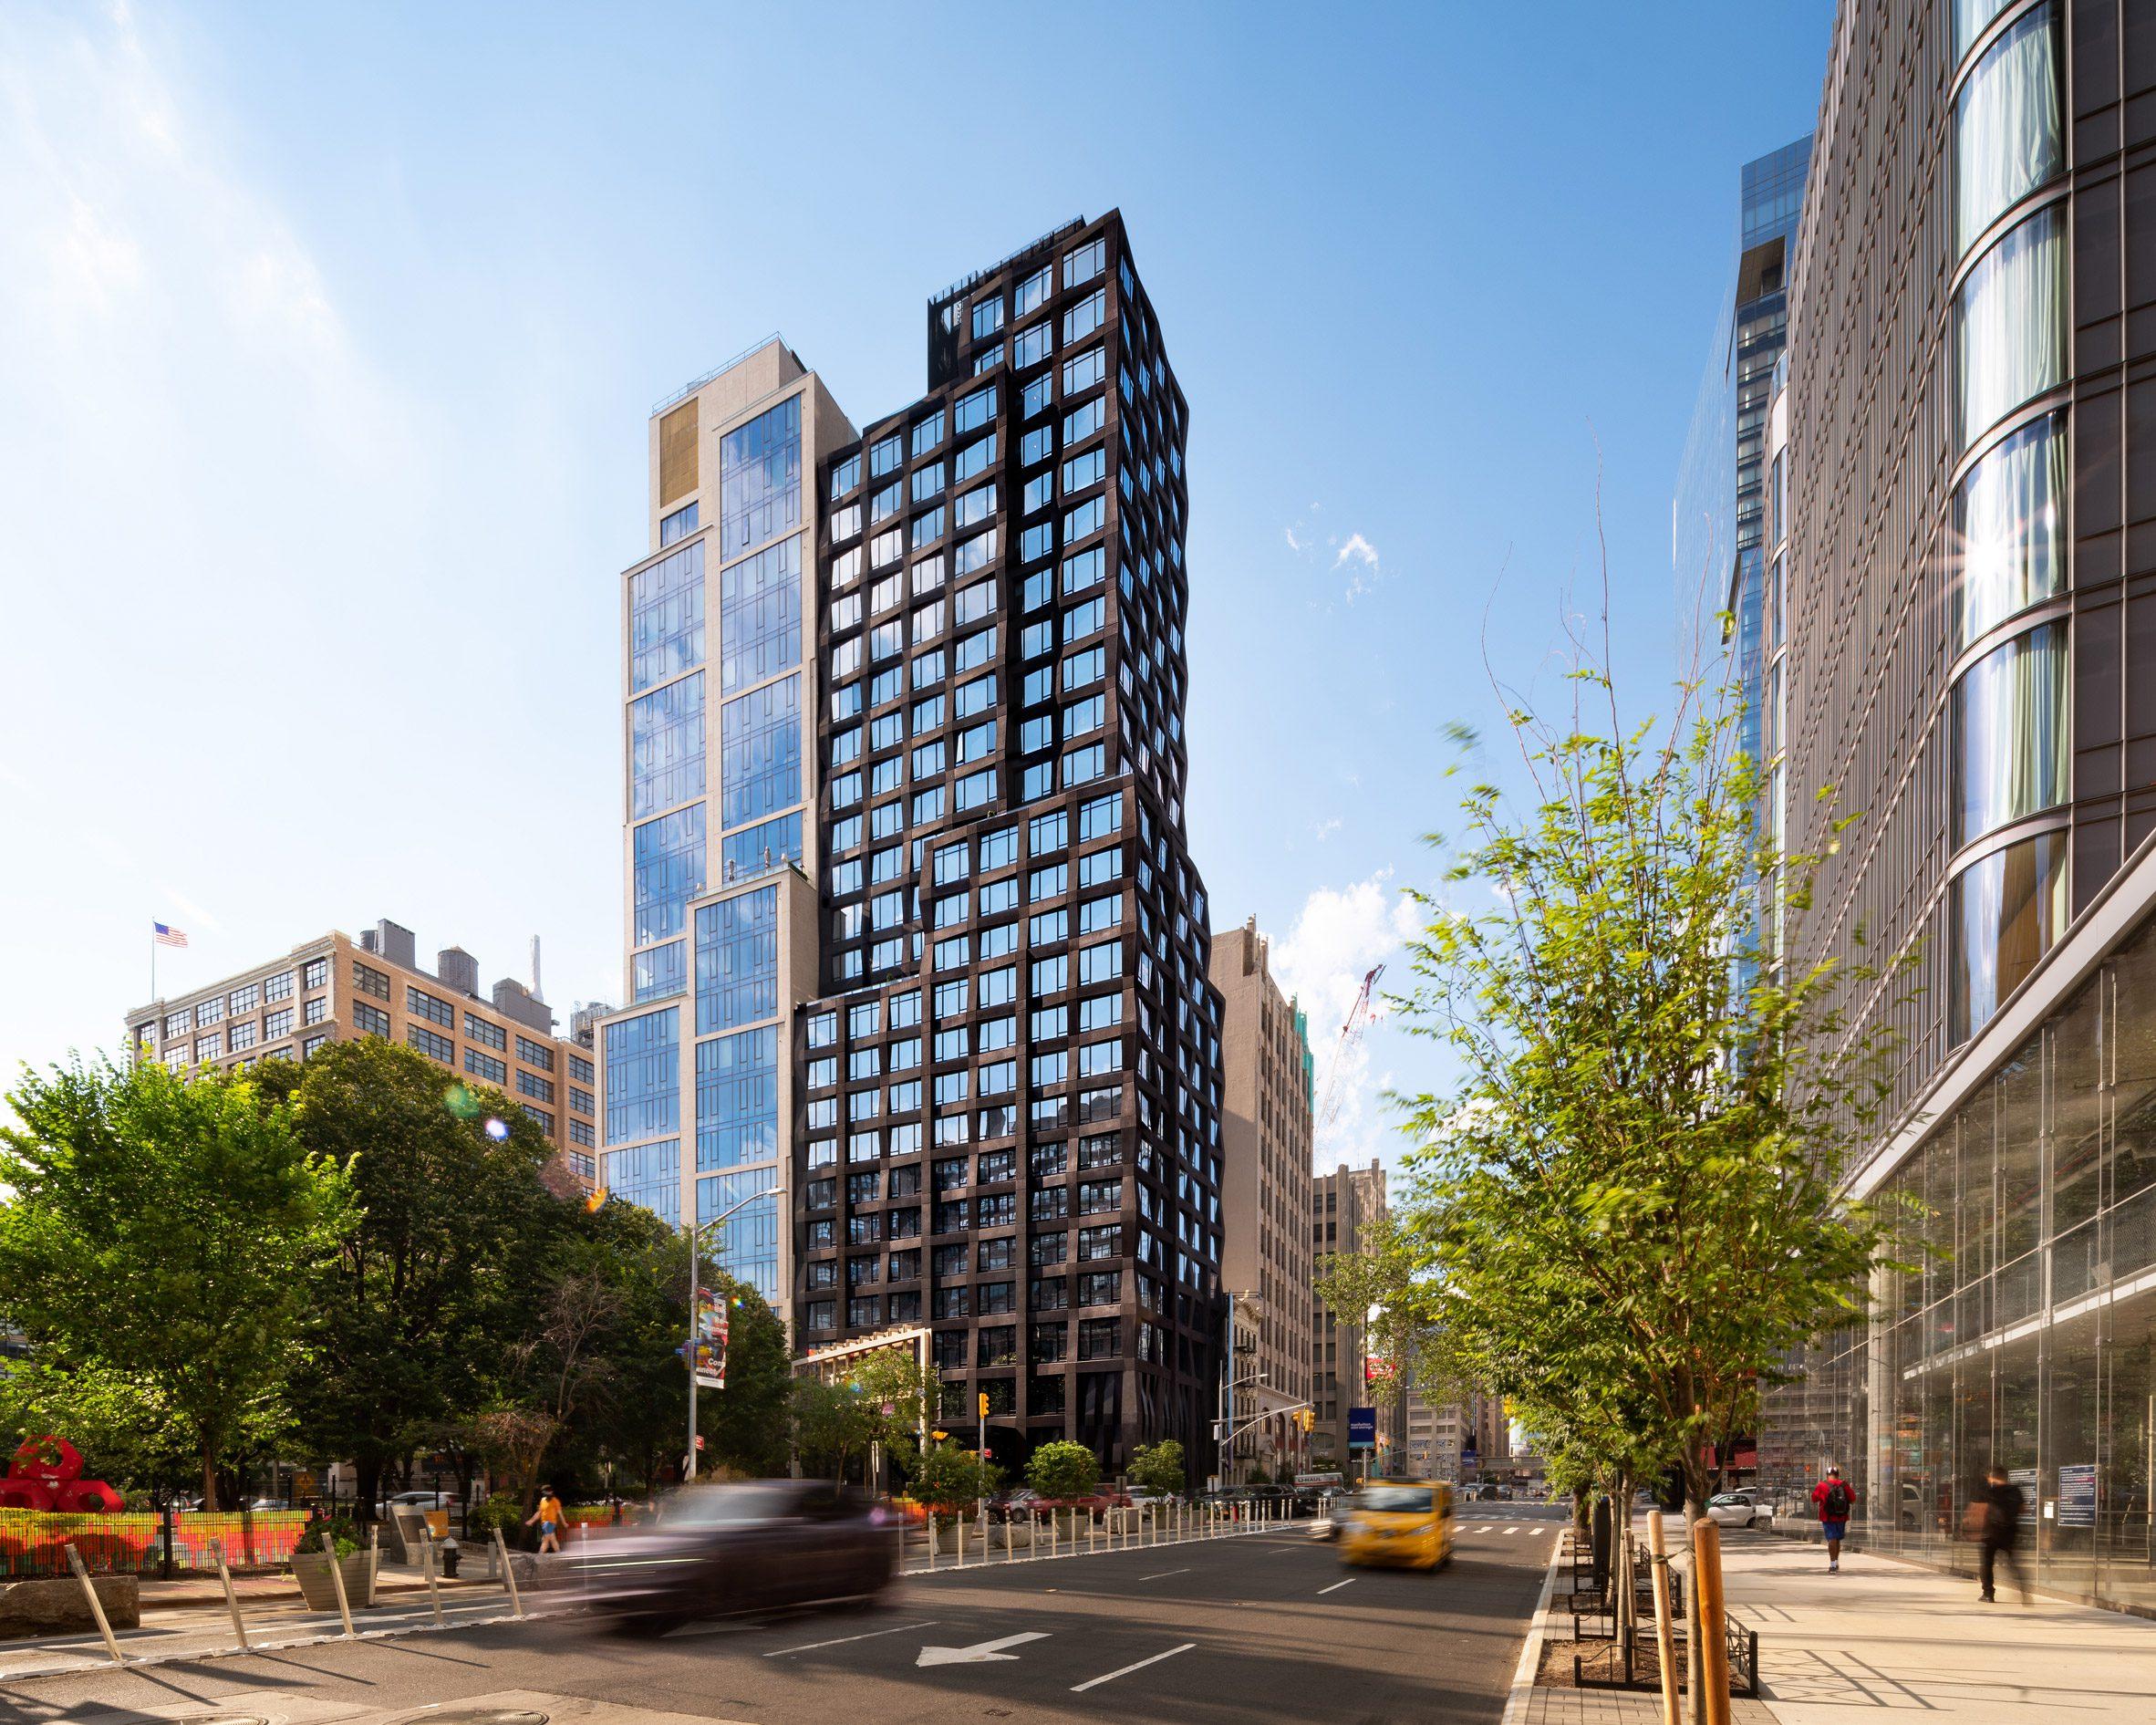 The tower in Manhattan